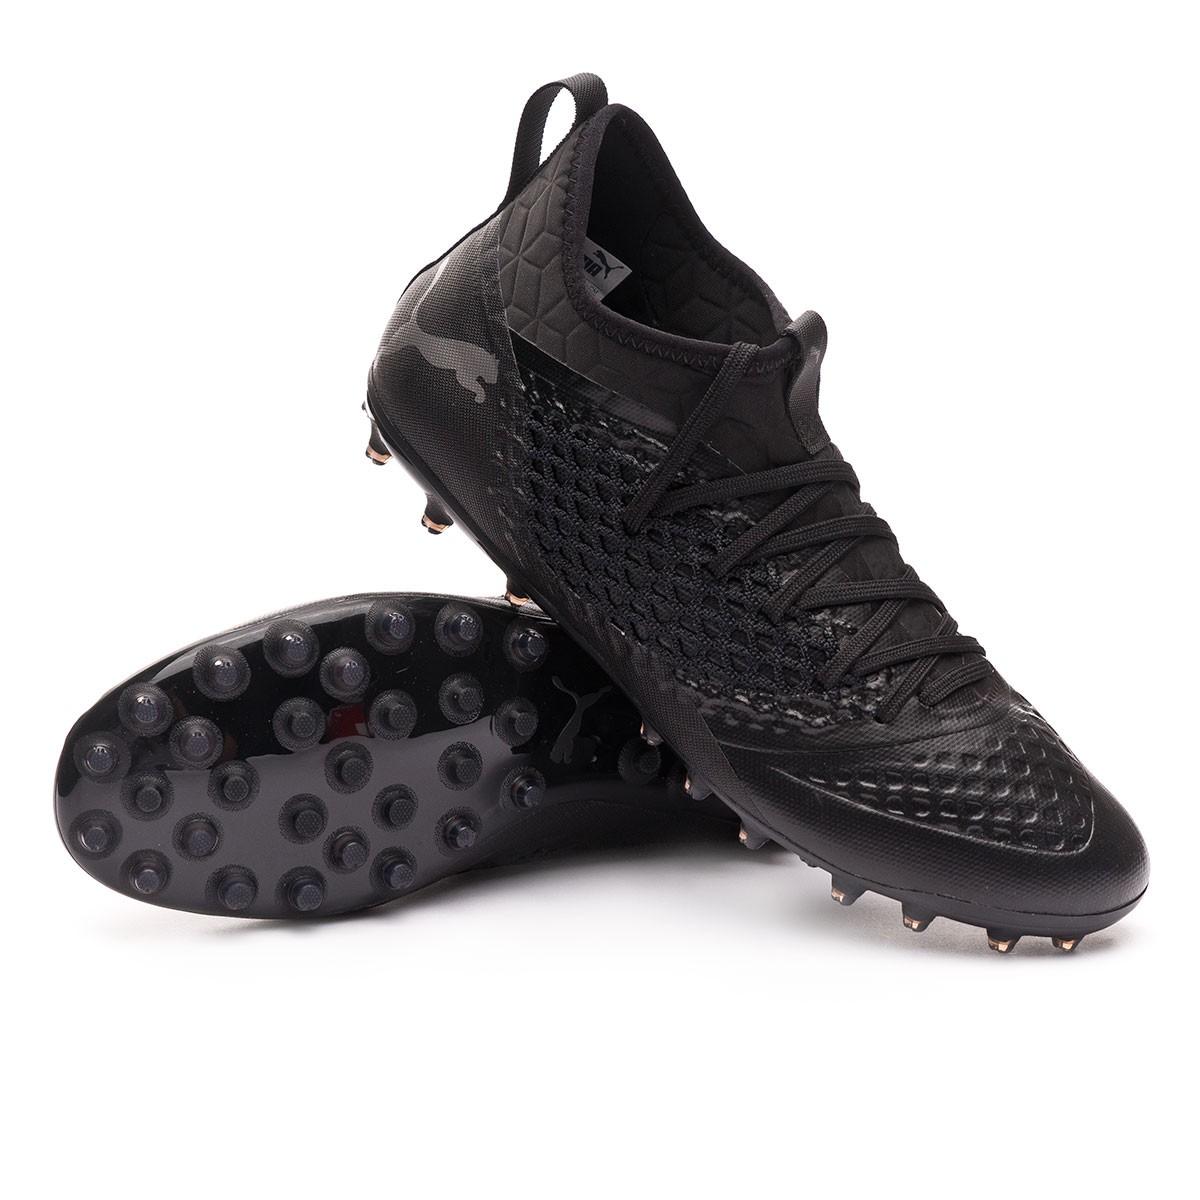 c88dde360 Football Boots Puma Future 2.3 Netfit MG Puma black - Football store Fútbol  Emotion